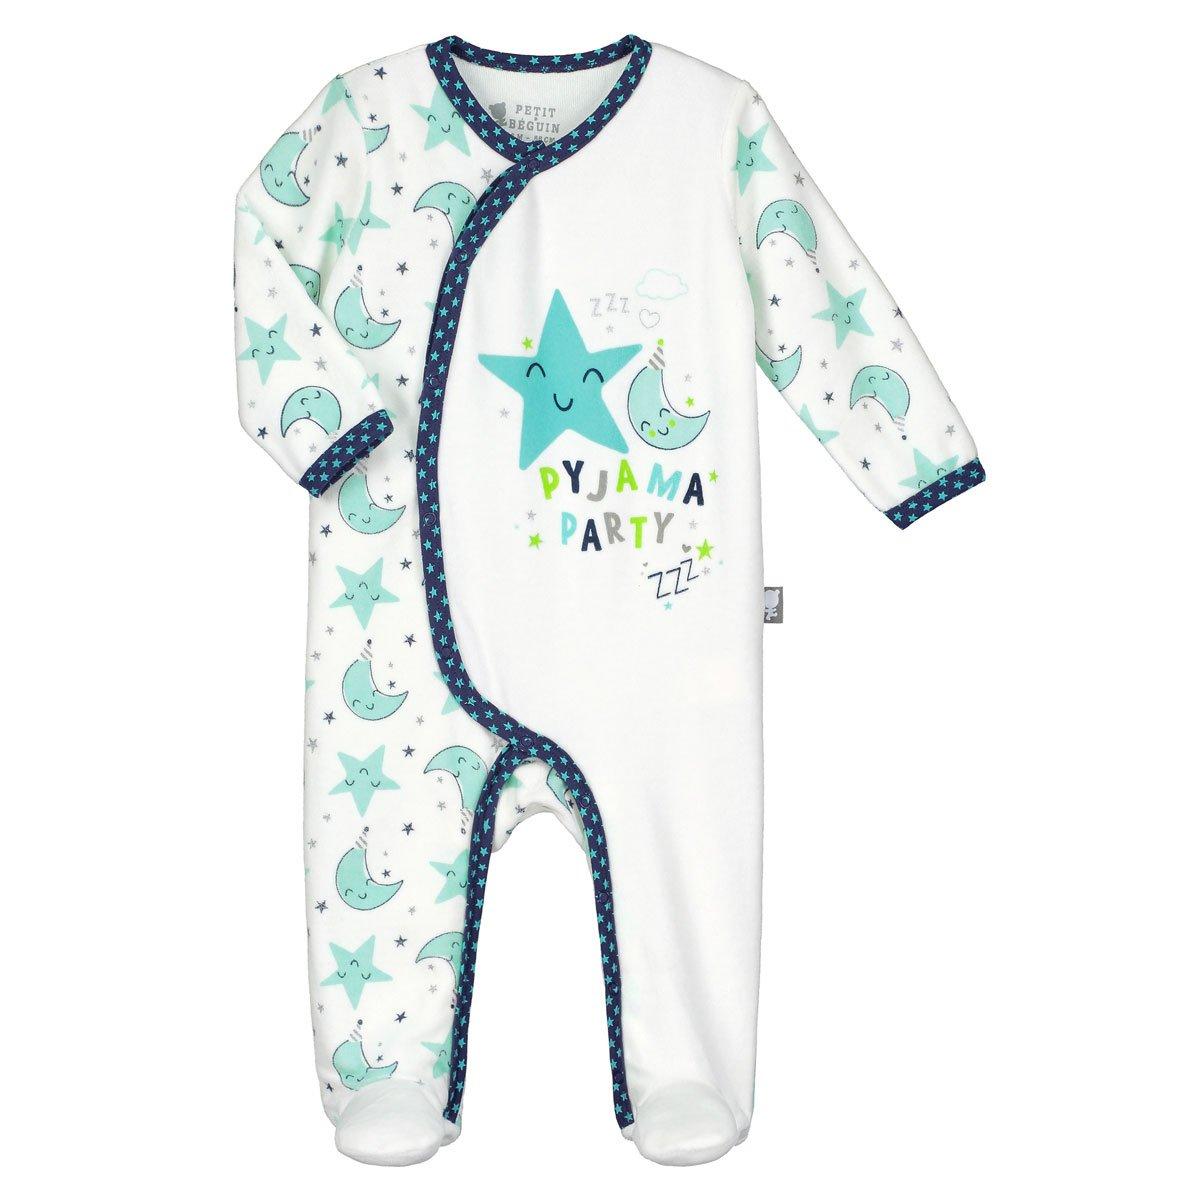 Pijama bebé terciopelo, color crema pijama Party–Talla–nacimiento (50cm) color crema pijama Party-Talla-nacimiento (50cm) Petit Béguin